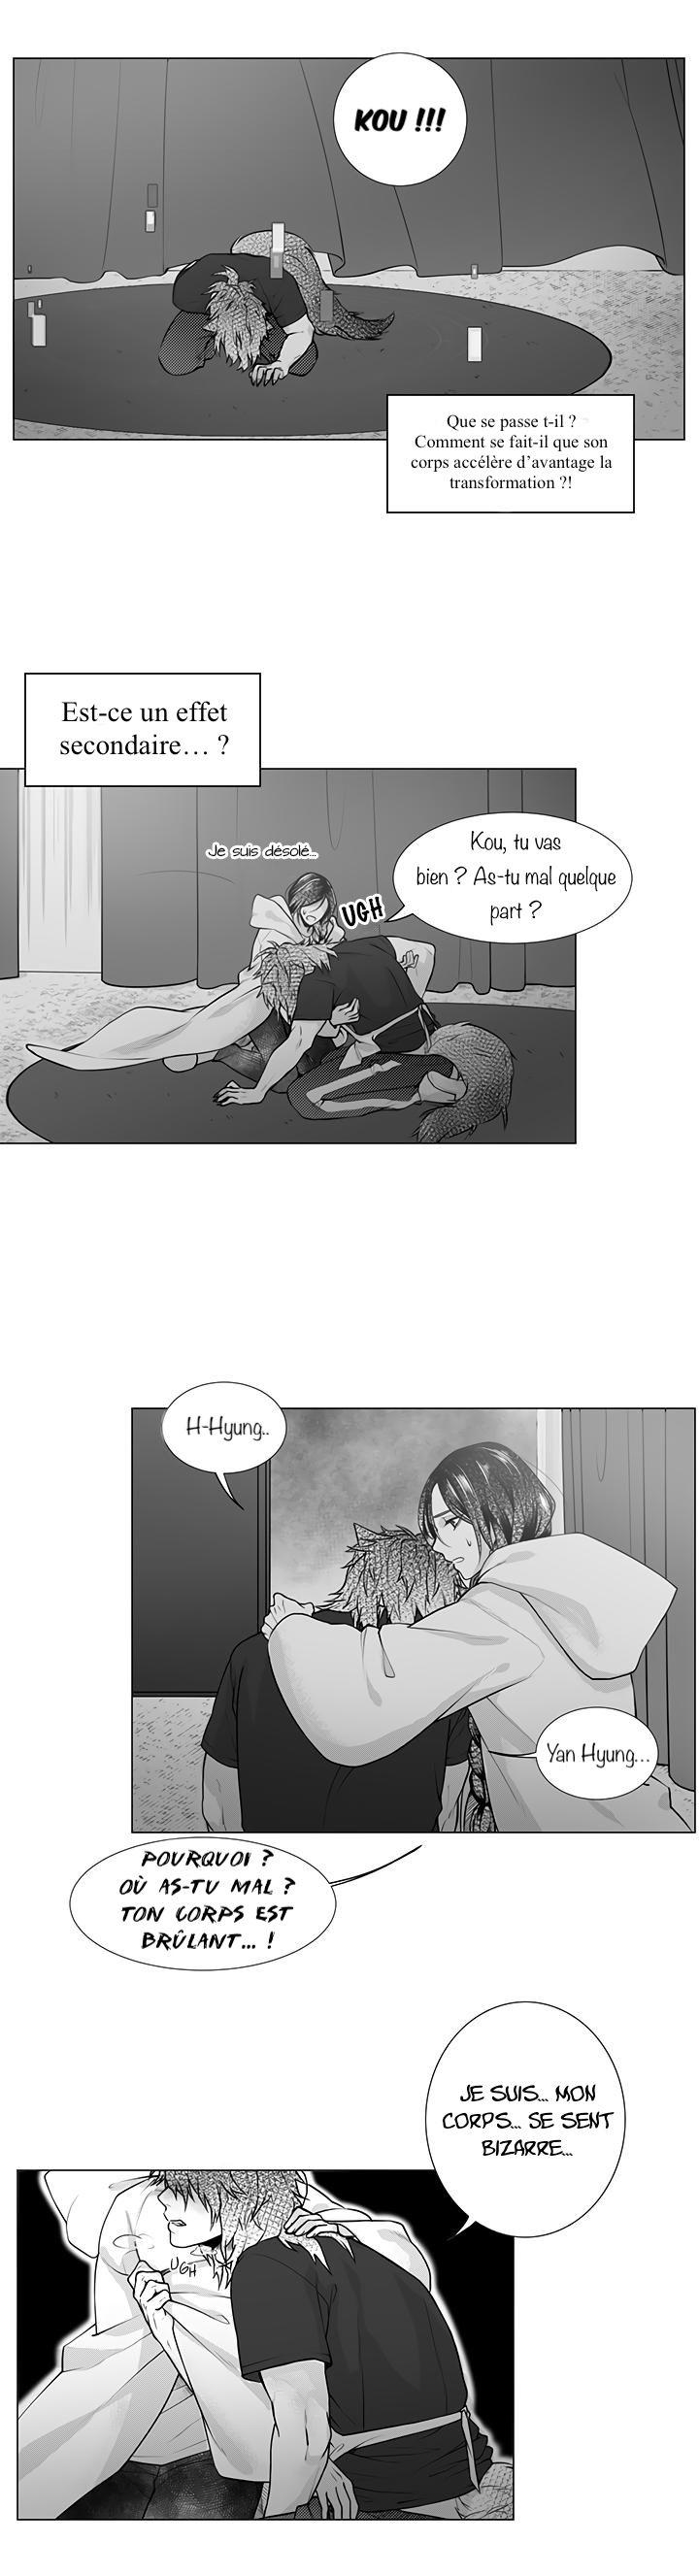 https://nine.mangadogs.com/fr_manga/pic2/59/11515/529551/TheWizardandtheNEETChapitr_5_484.jpg Page 6